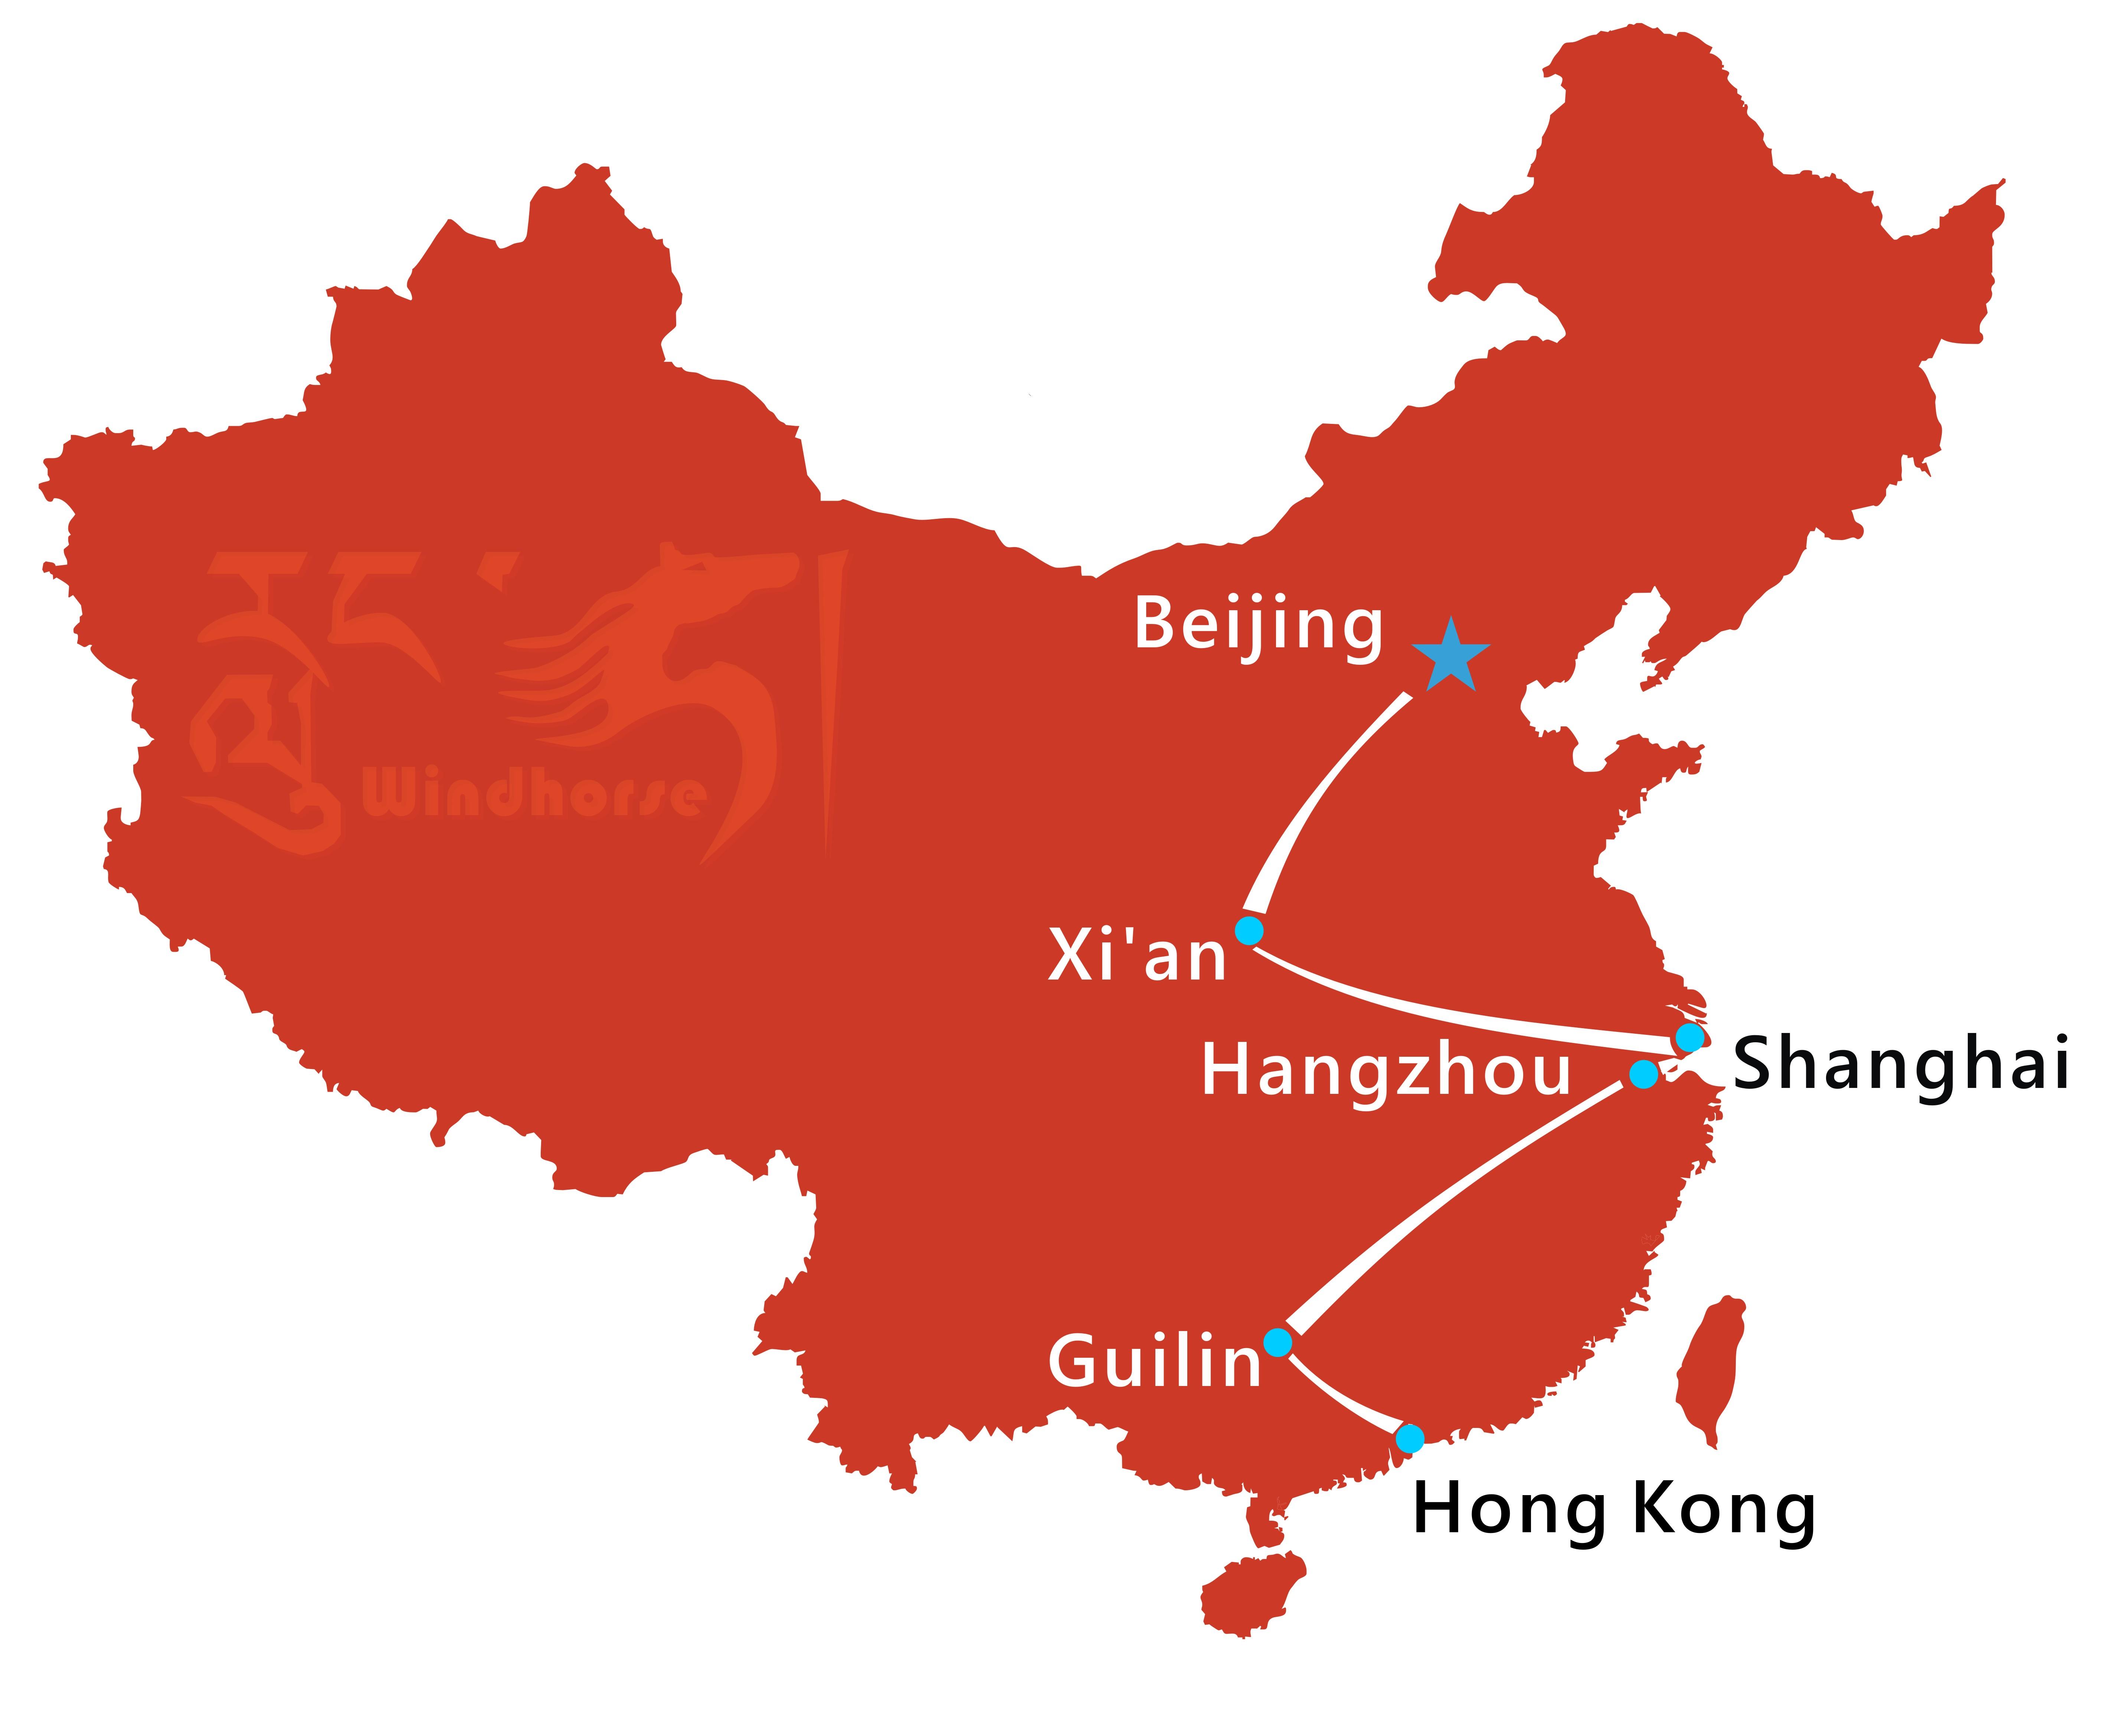 Beijing Shanghai Hongkong Tour Route